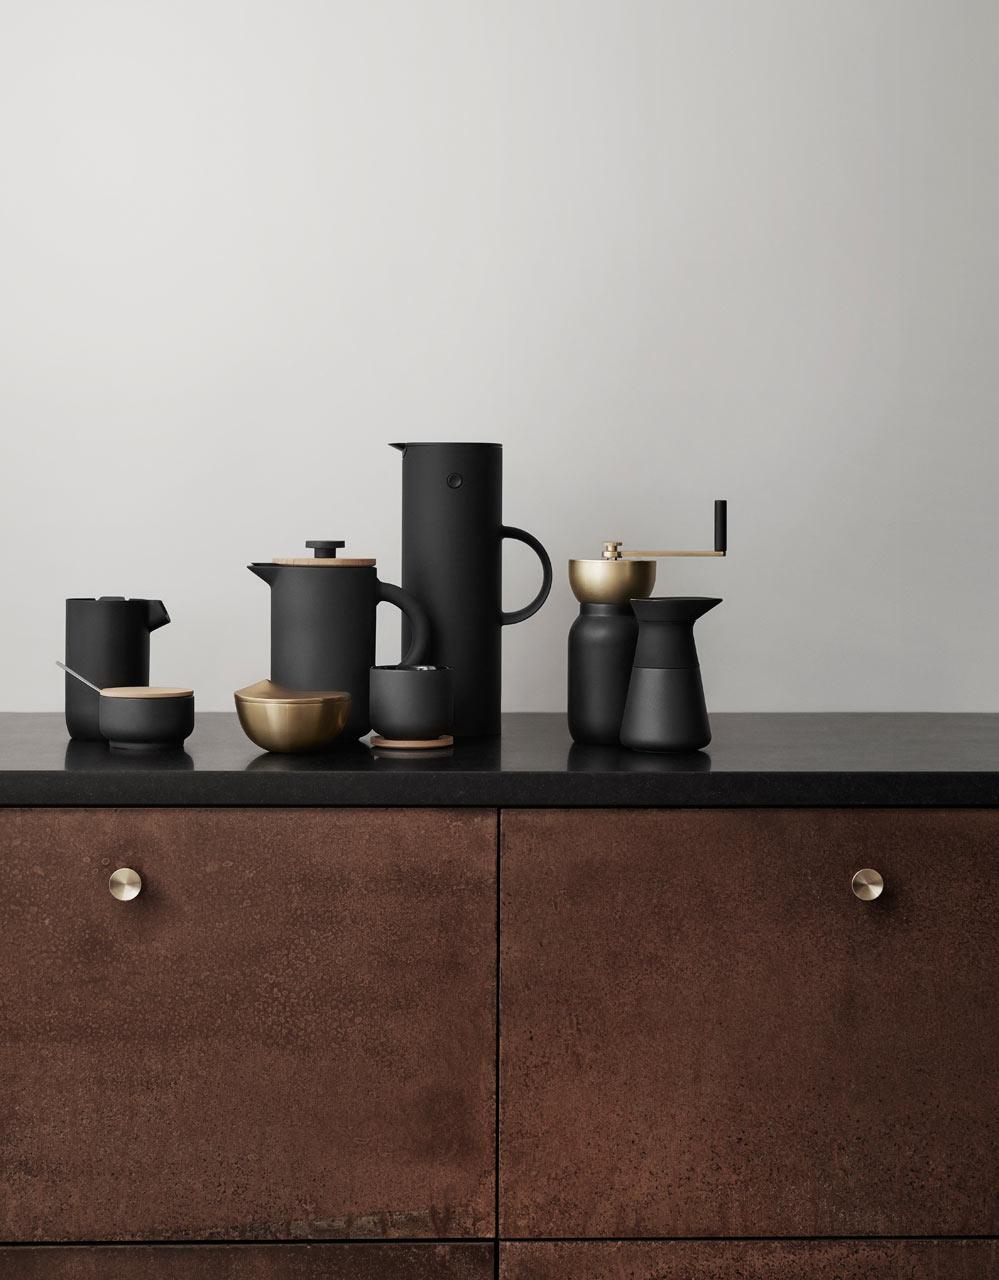 Collar-Coffee-brewer-Stelton_dezainaa_3